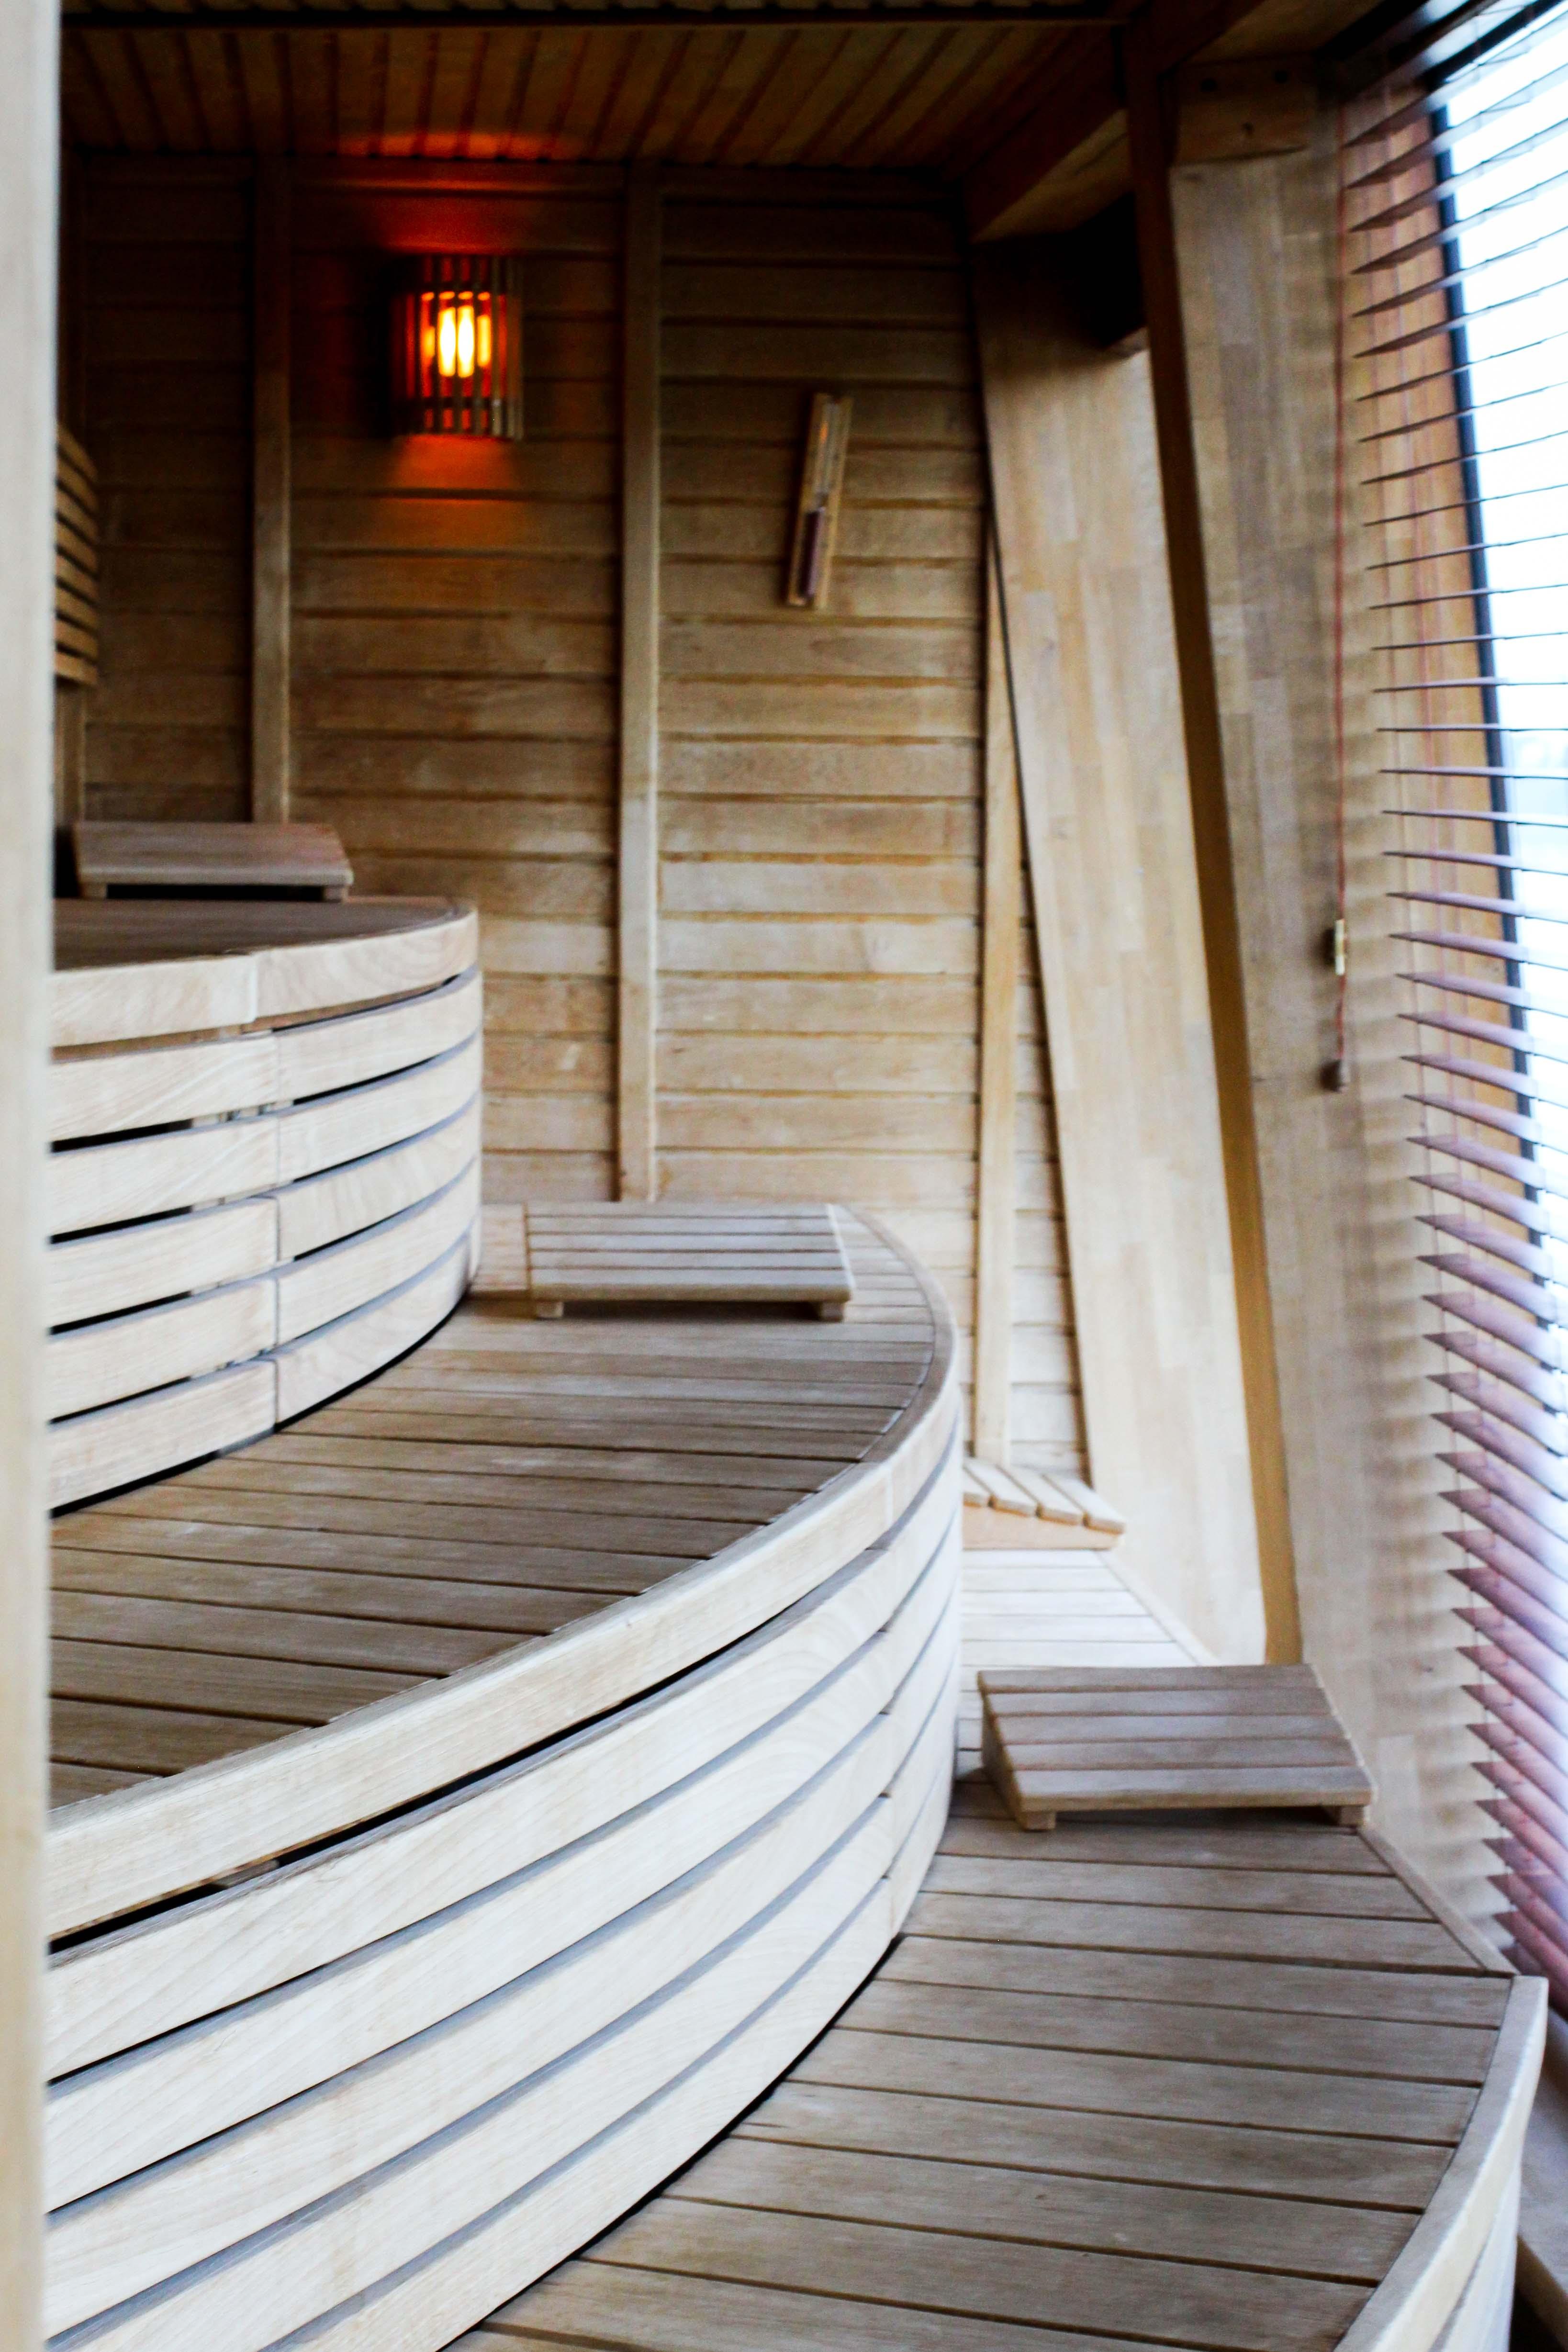 Donaukreuzfahrt A-Rosa Bella Wellnessbereich finnische Sauna Flusskreuzfahrt Flusskreuzfahrtschiff 7 Tage Donau Klassik Tour Arosa Reiseblogger